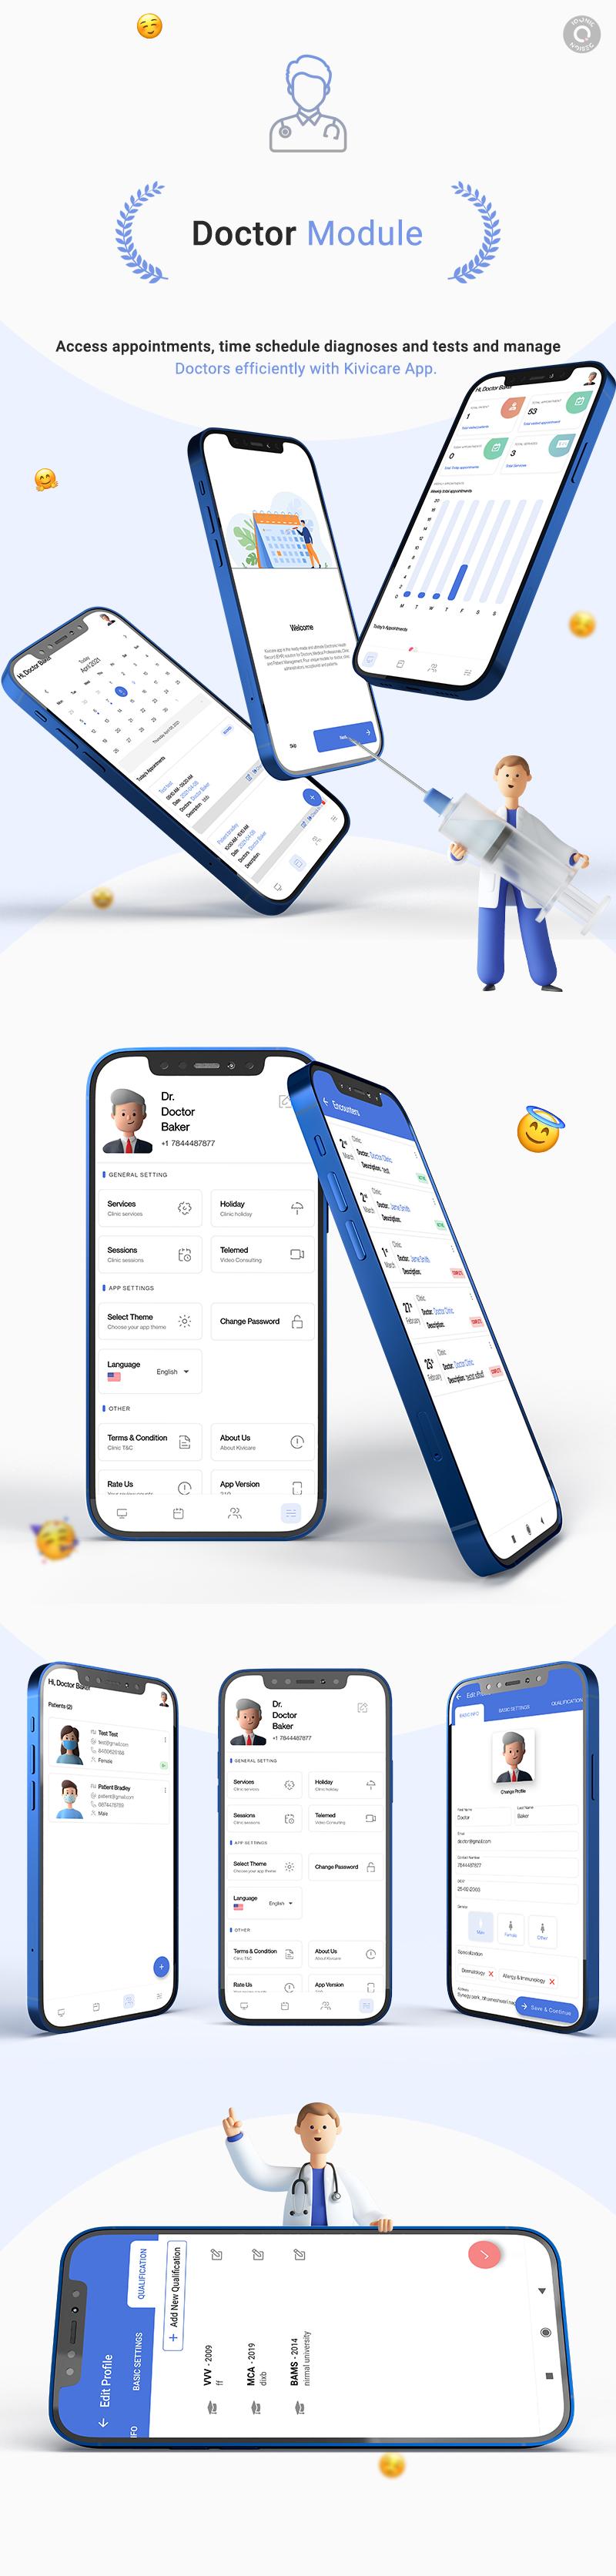 KiviCare Flutter 2.0 App – Clinic & Patient Management System - 11 clinic and patient management system KiviCare Flutter 2.0 App doctor